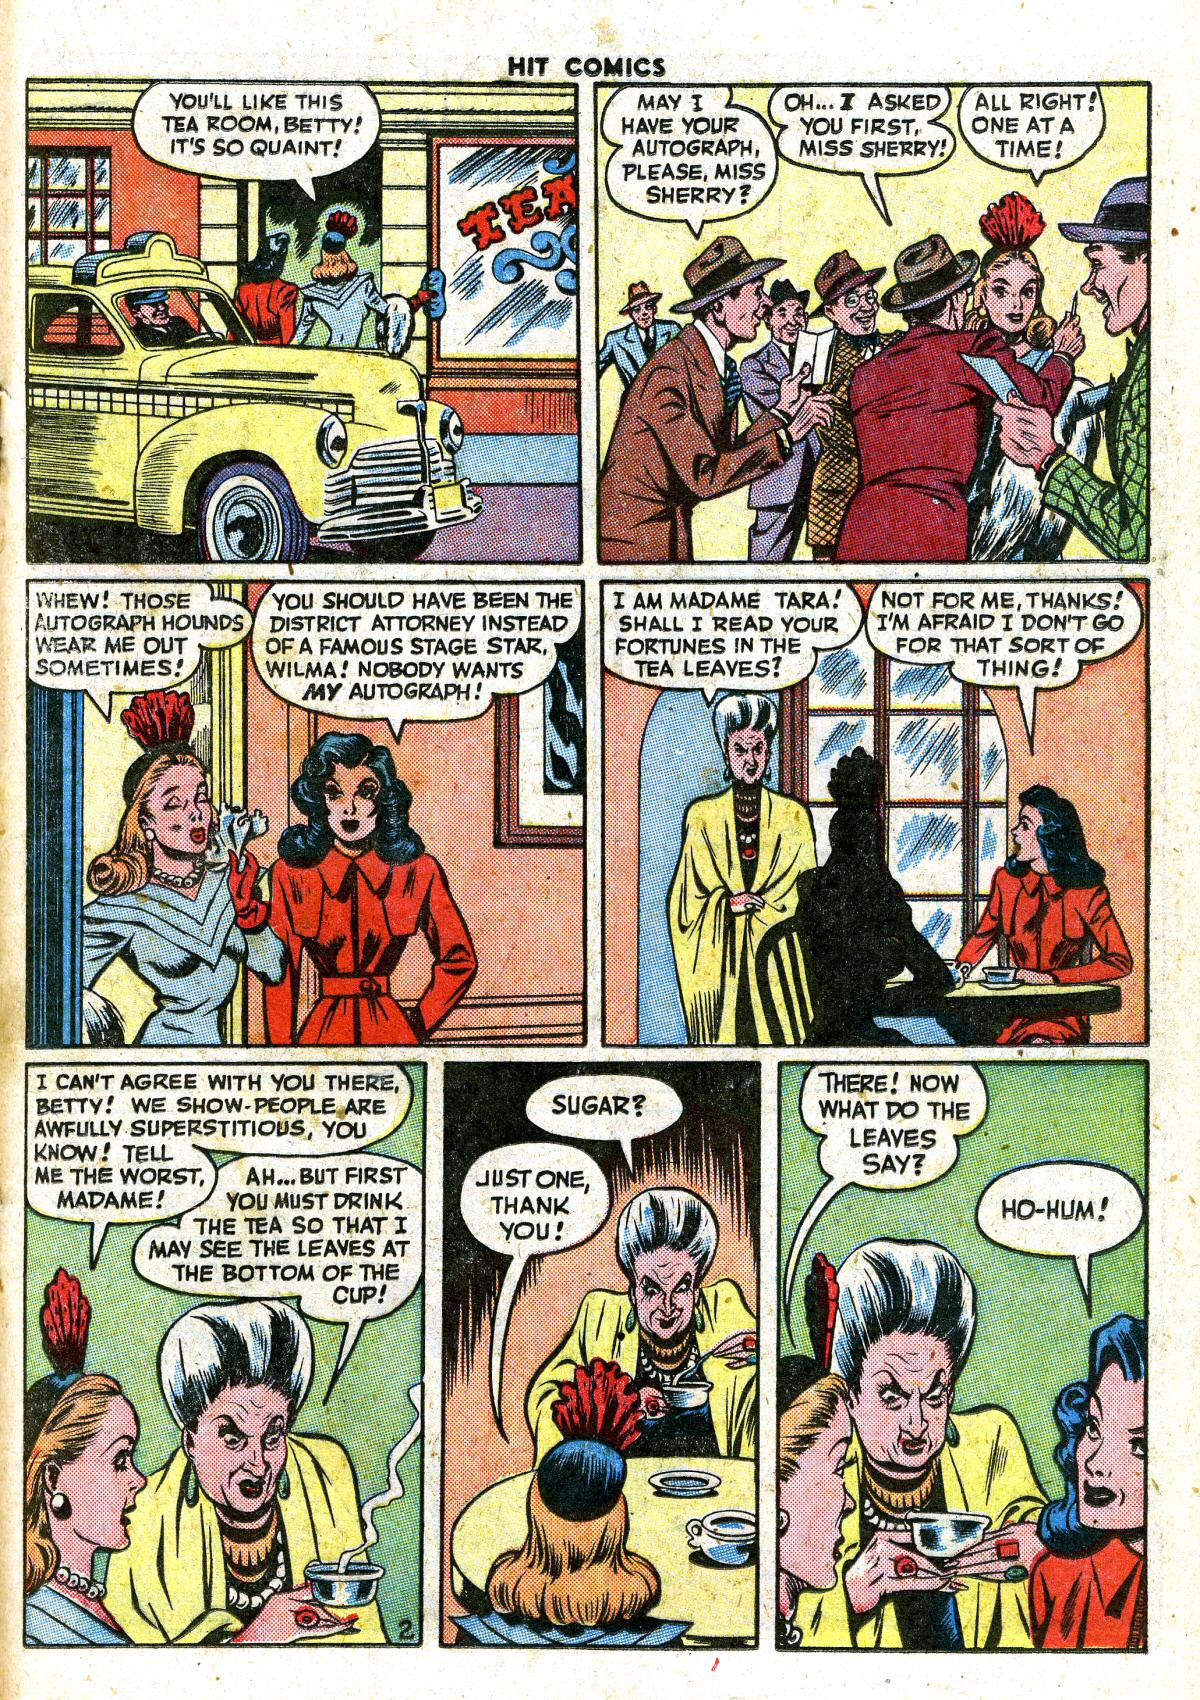 Read online Hit Comics comic -  Issue #41 - 31